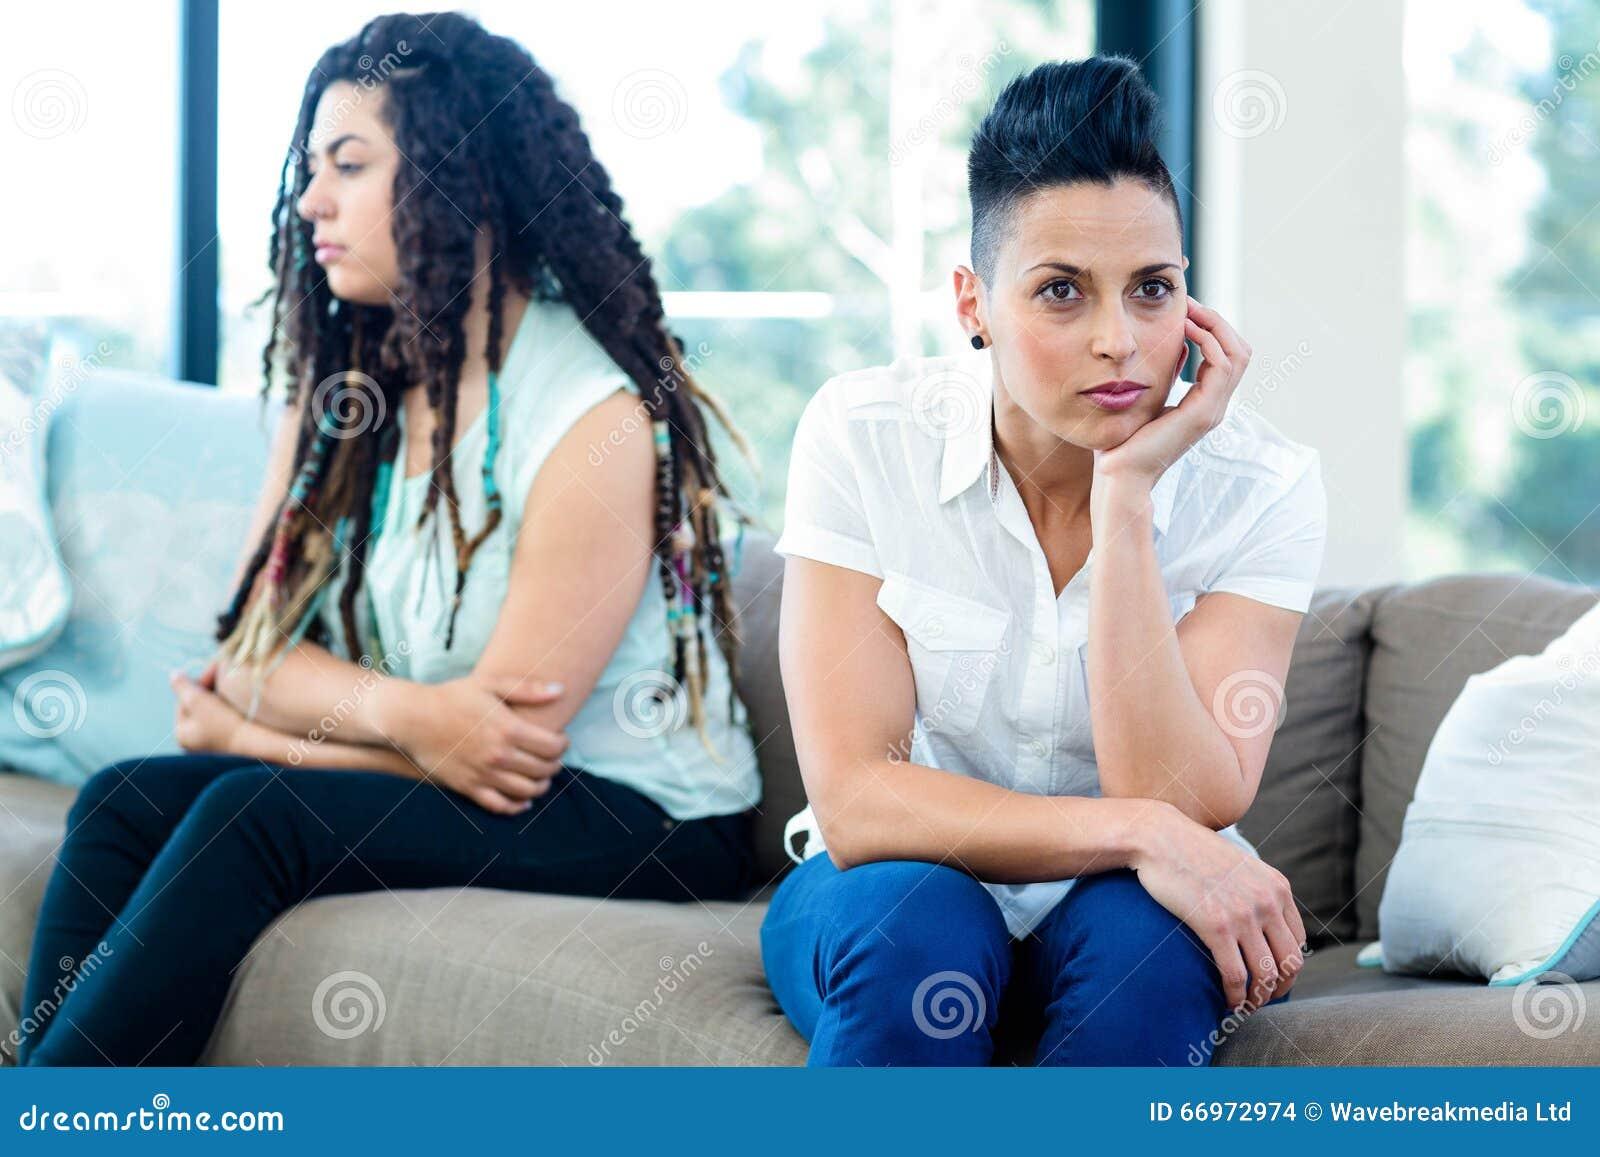 Unhappy lesbian couple sitting on sofa